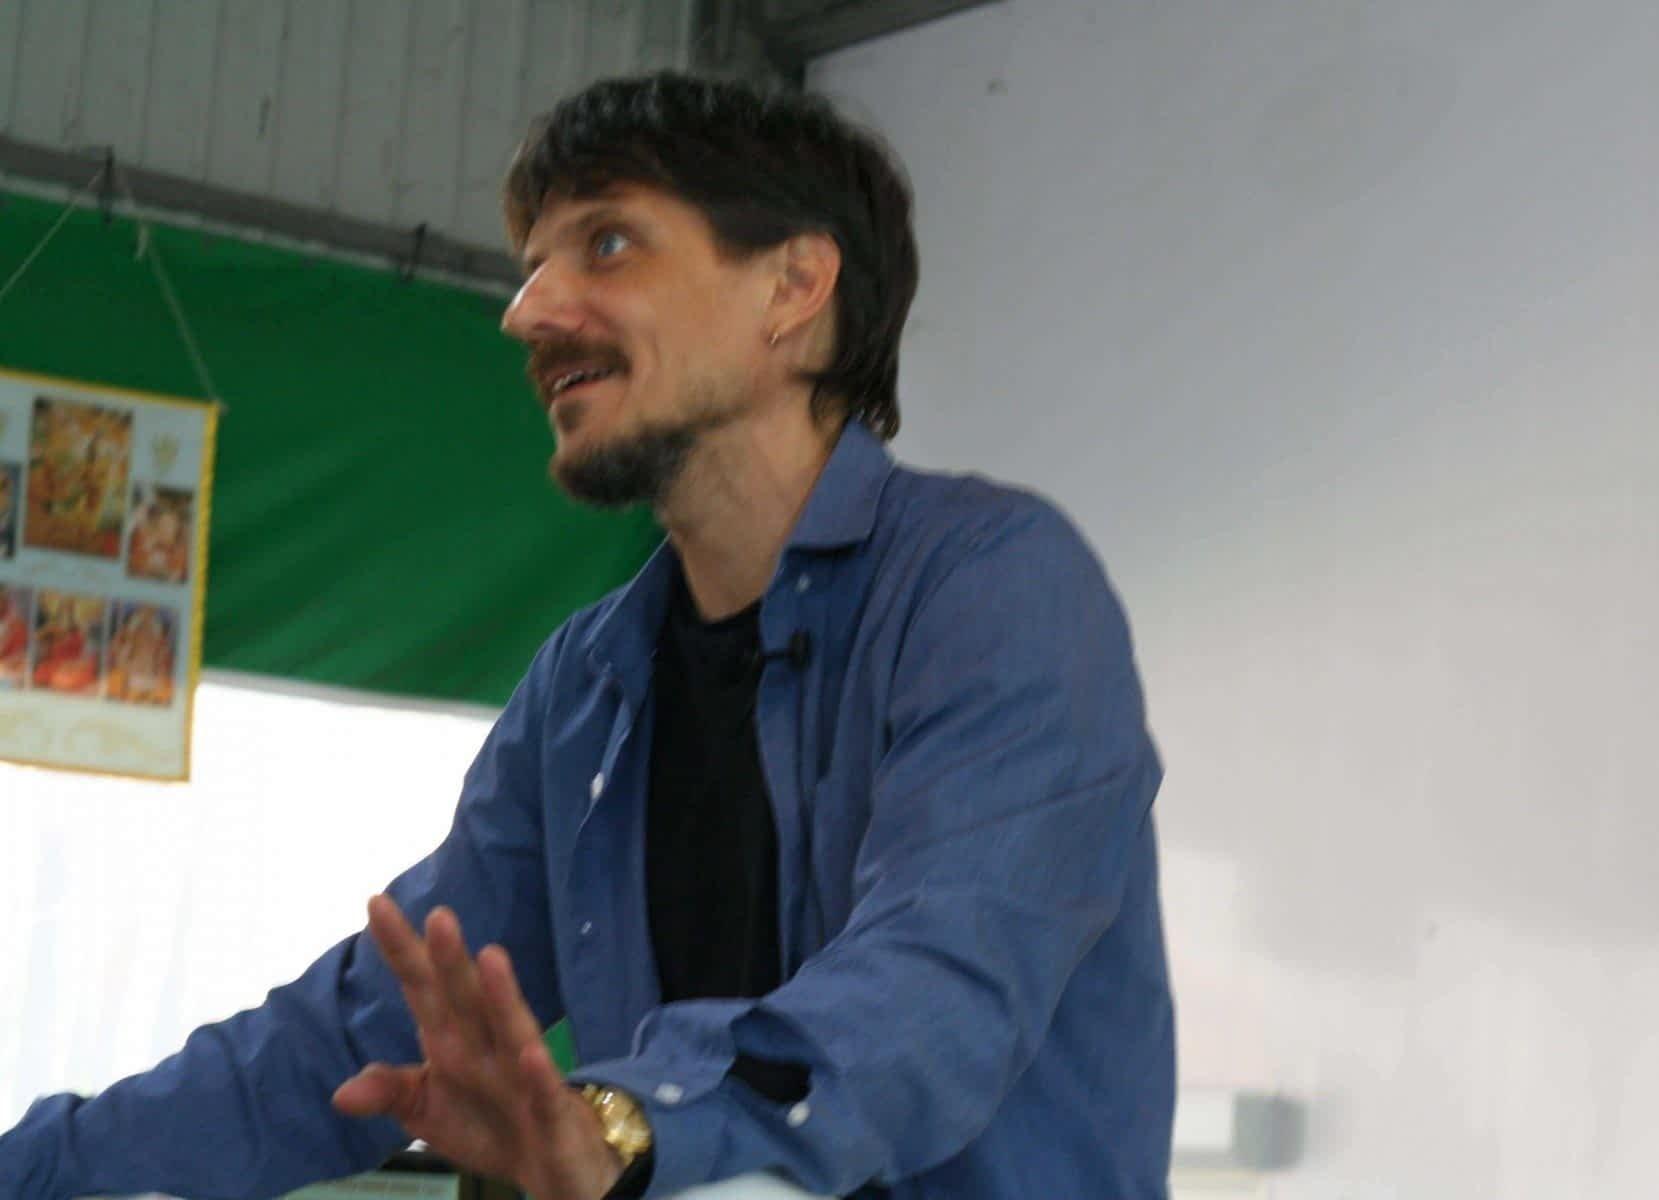 *** Антон Михайлович Кузнецов — семинар і выступления — фестиваль «ДжйотіФест 2019» — фото ***